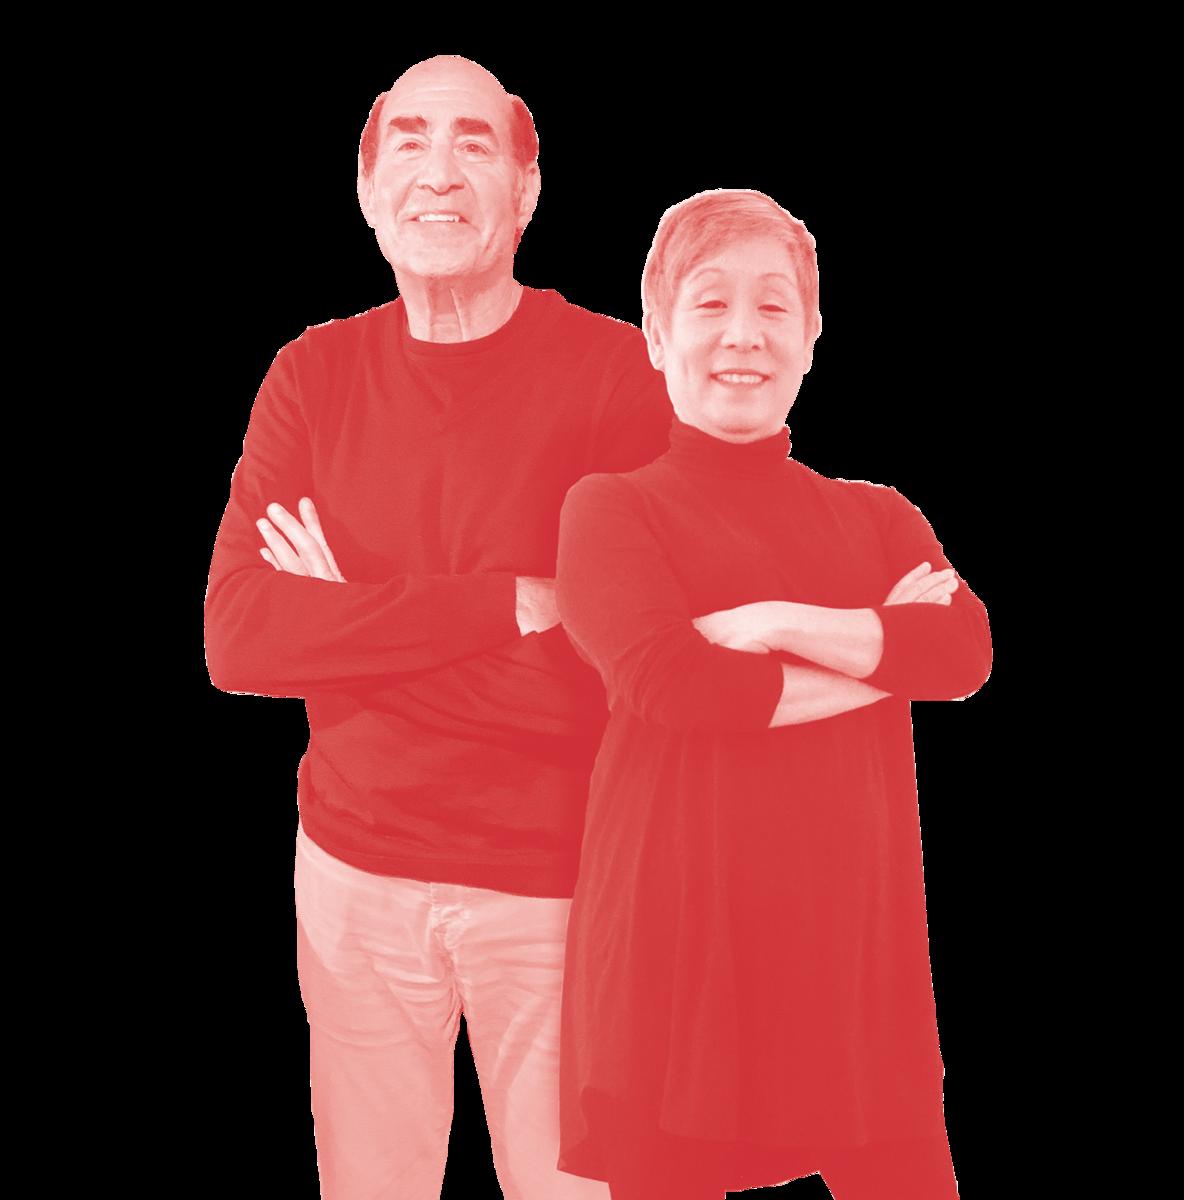 Photograph of Jim Copacino and Betti Fujikado, agency founders